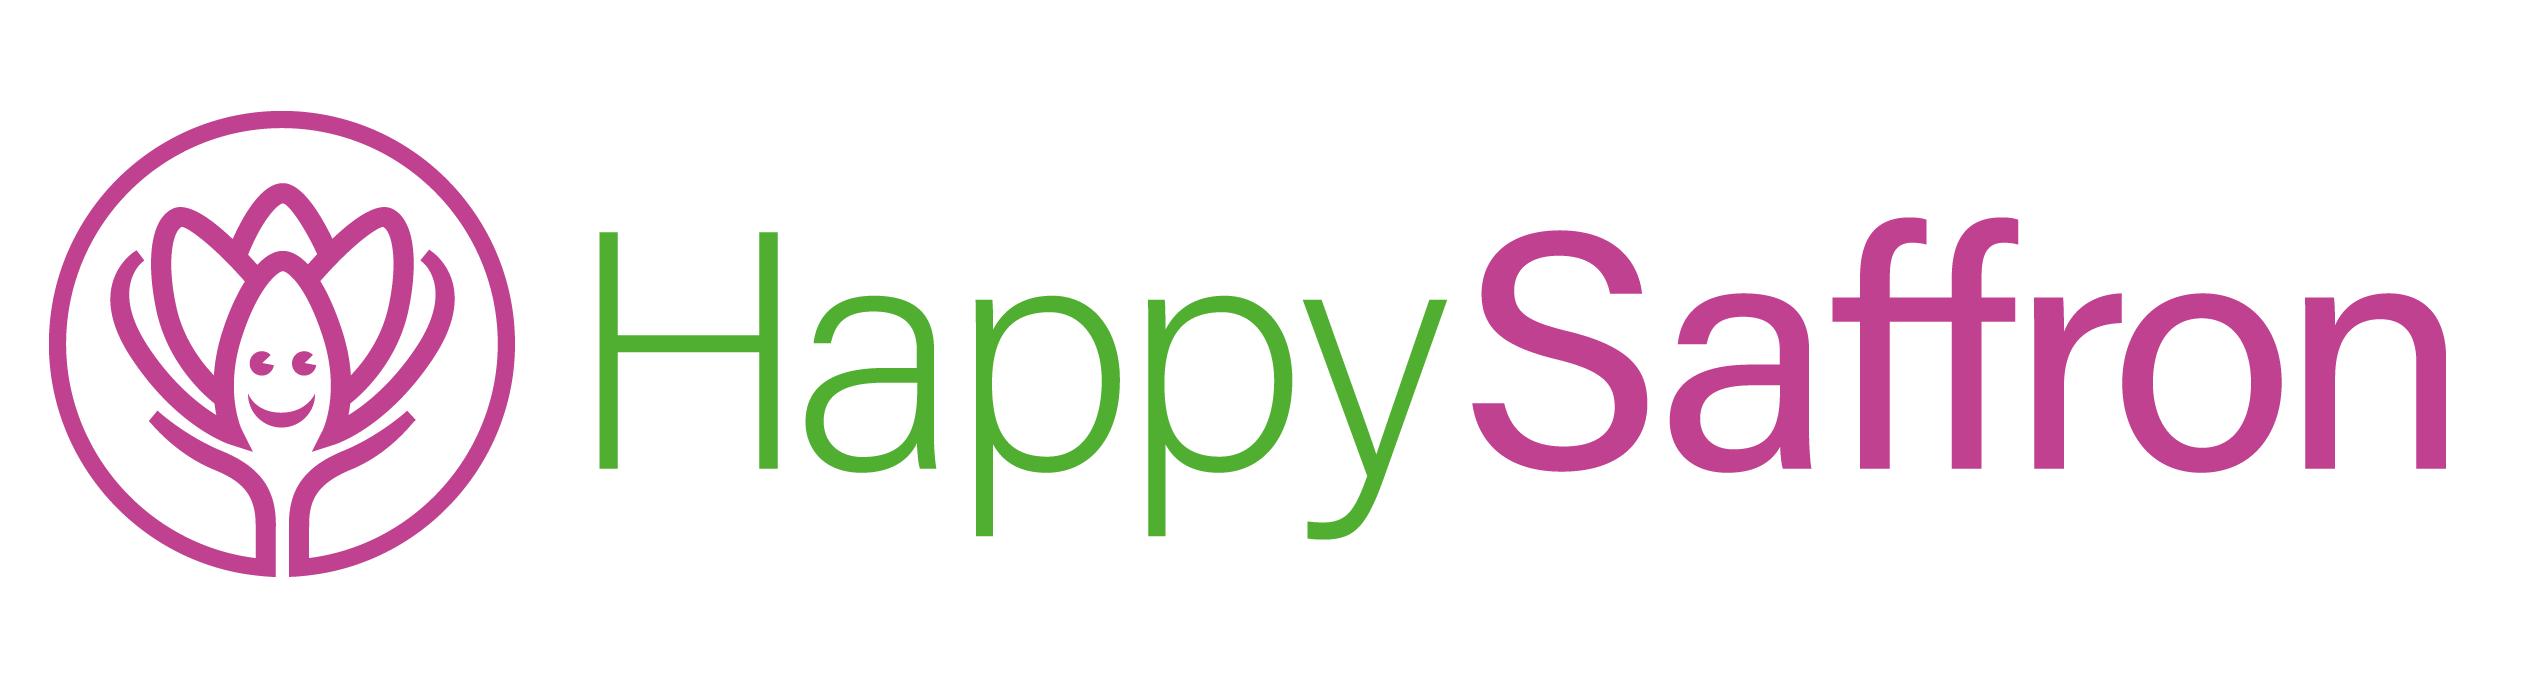 Happy_Saffron_logo_liggend_def